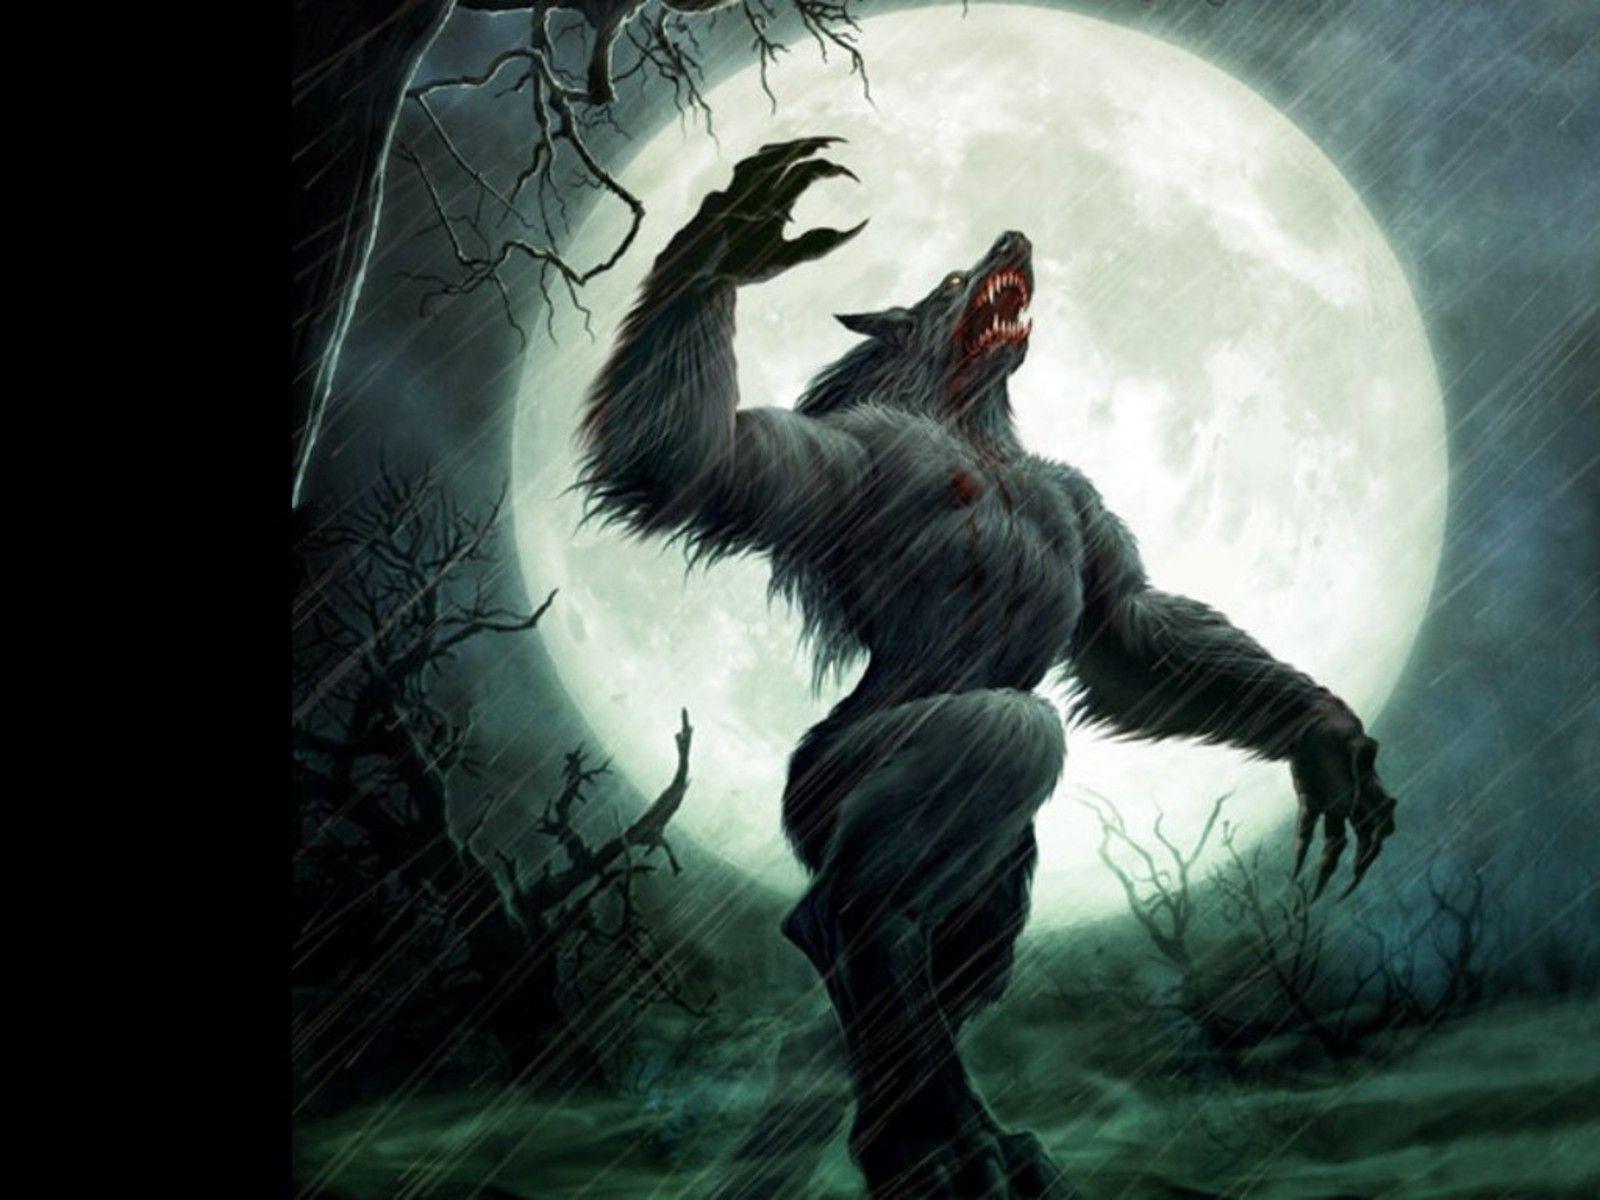 Werewolf Anime Wallpapers - Wallpaper Cave